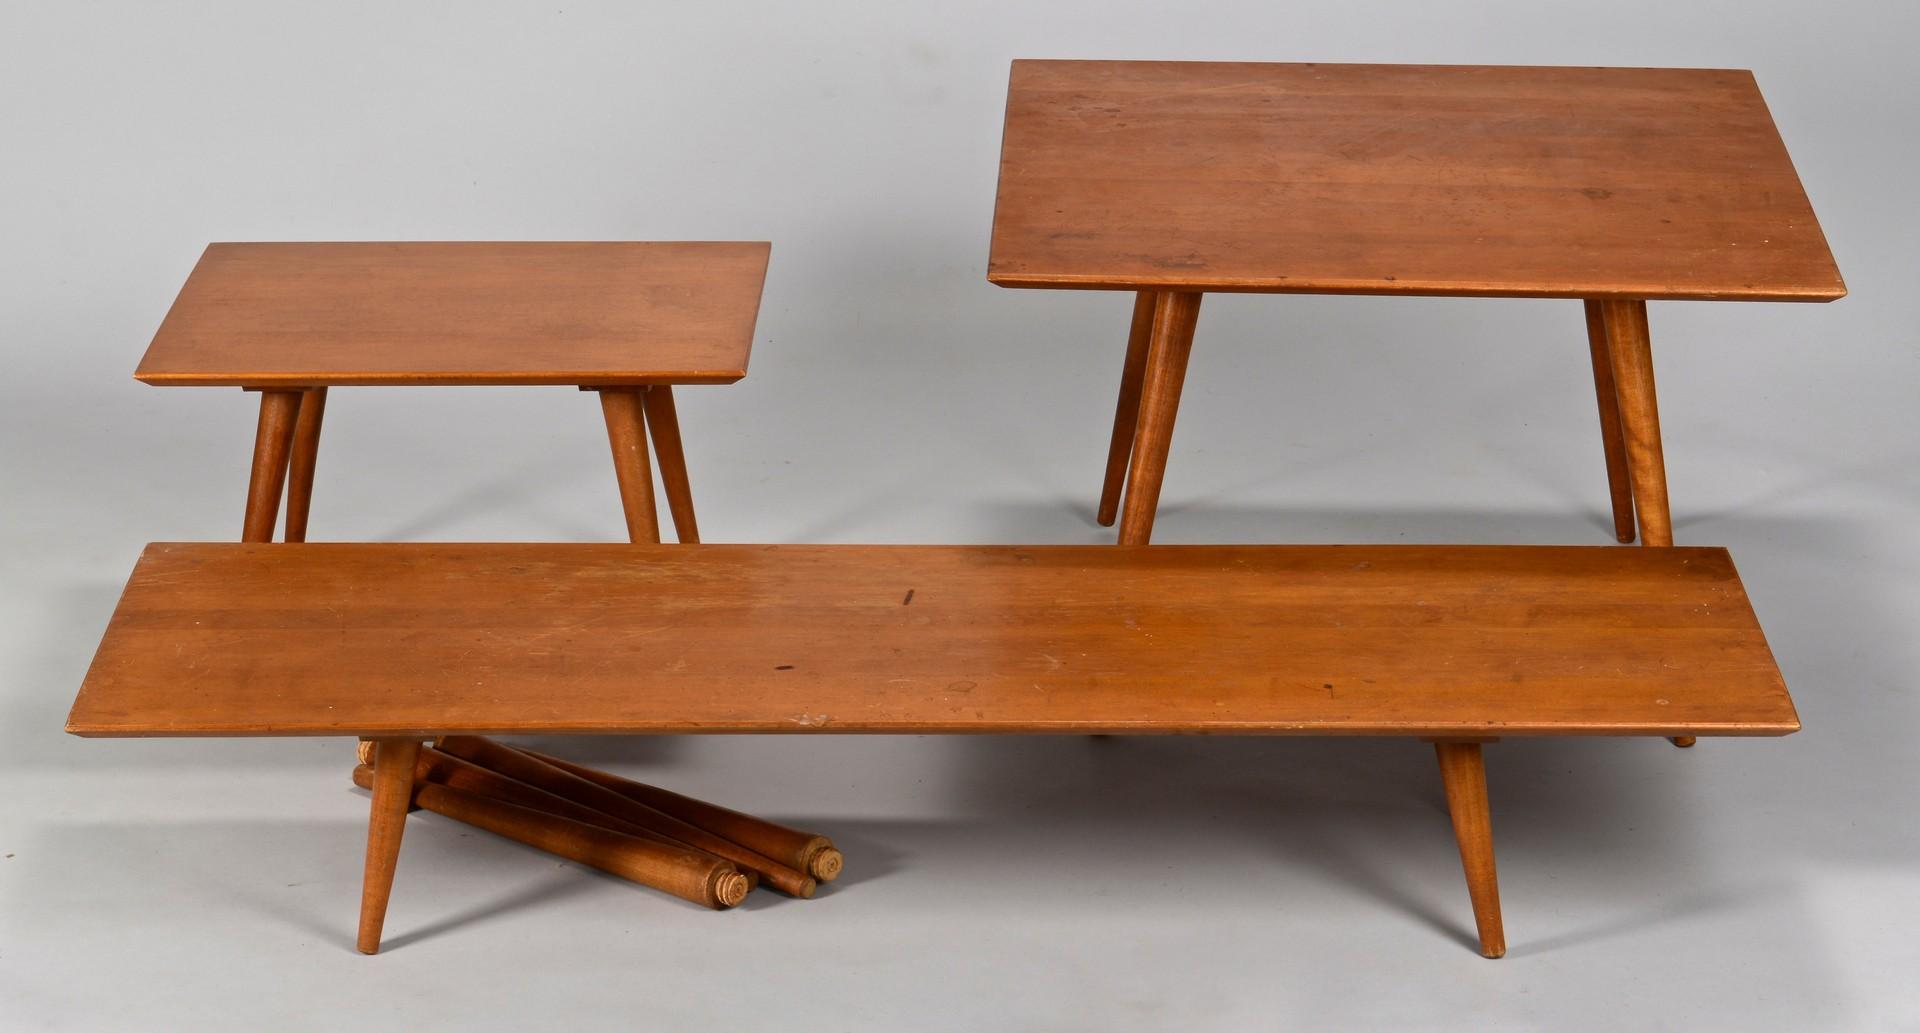 Lot 309: Paul McCobb Midcentury Furniture Set